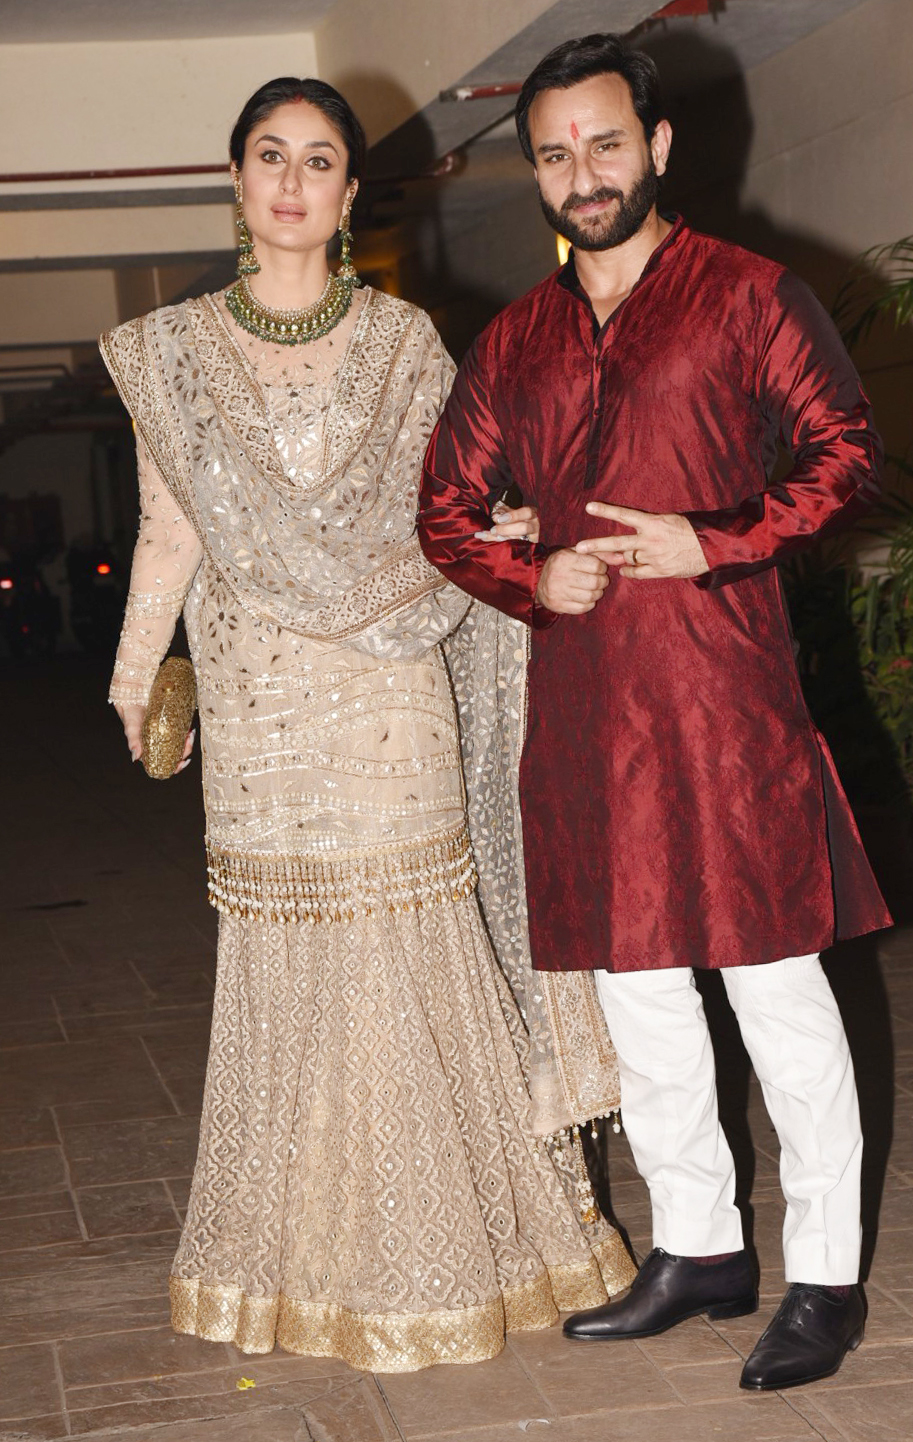 saif kareena at their residence in bandra on 19 10 17.pics yogen shah. 6